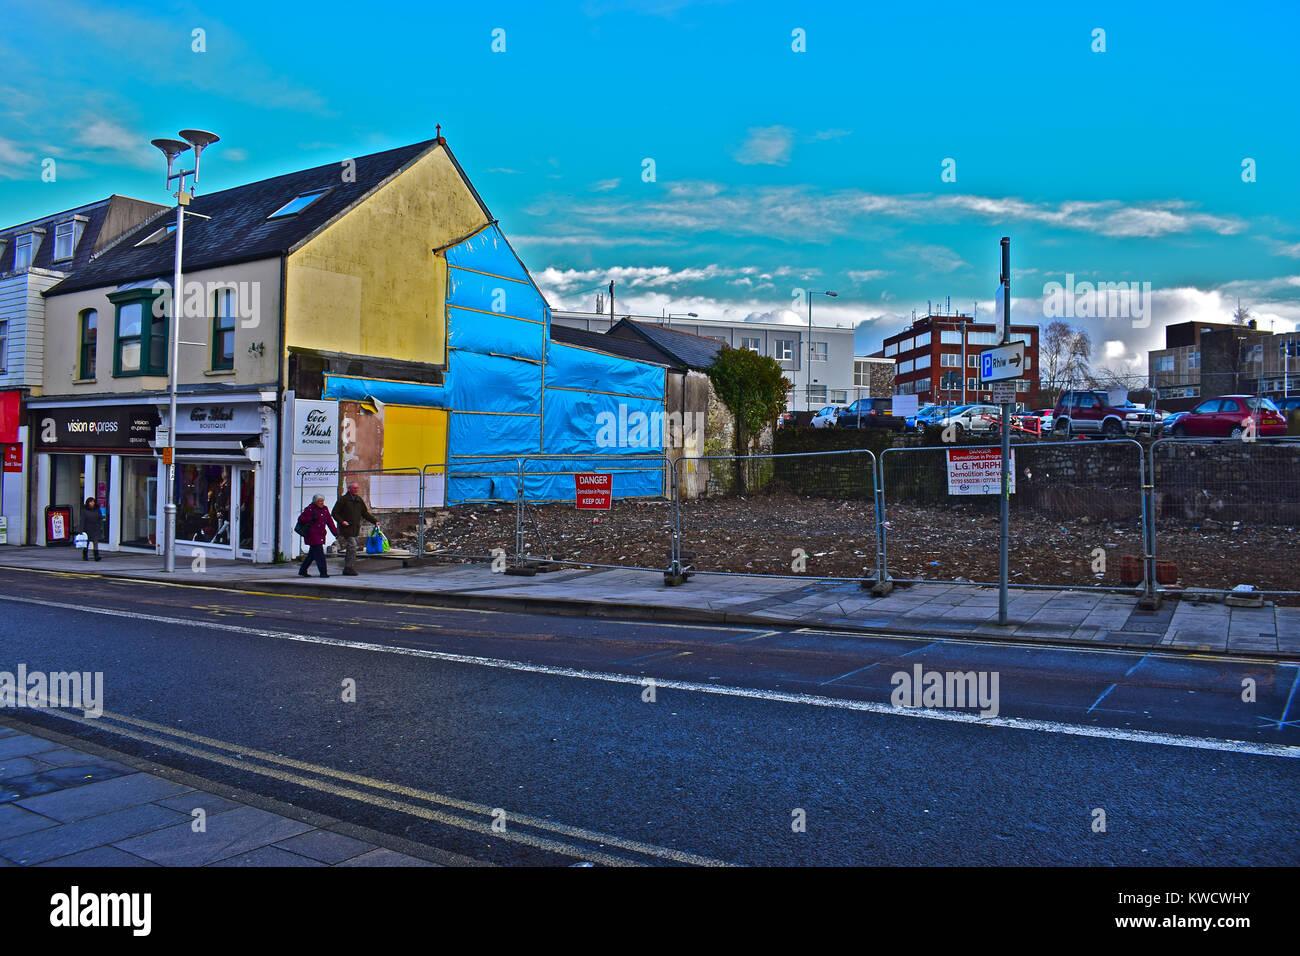 Demolished Retail Premises (former McDonalds Restaurant) in Nolton Street, Bridgend Town Centre. Site ripe for redevelopement - Stock Image